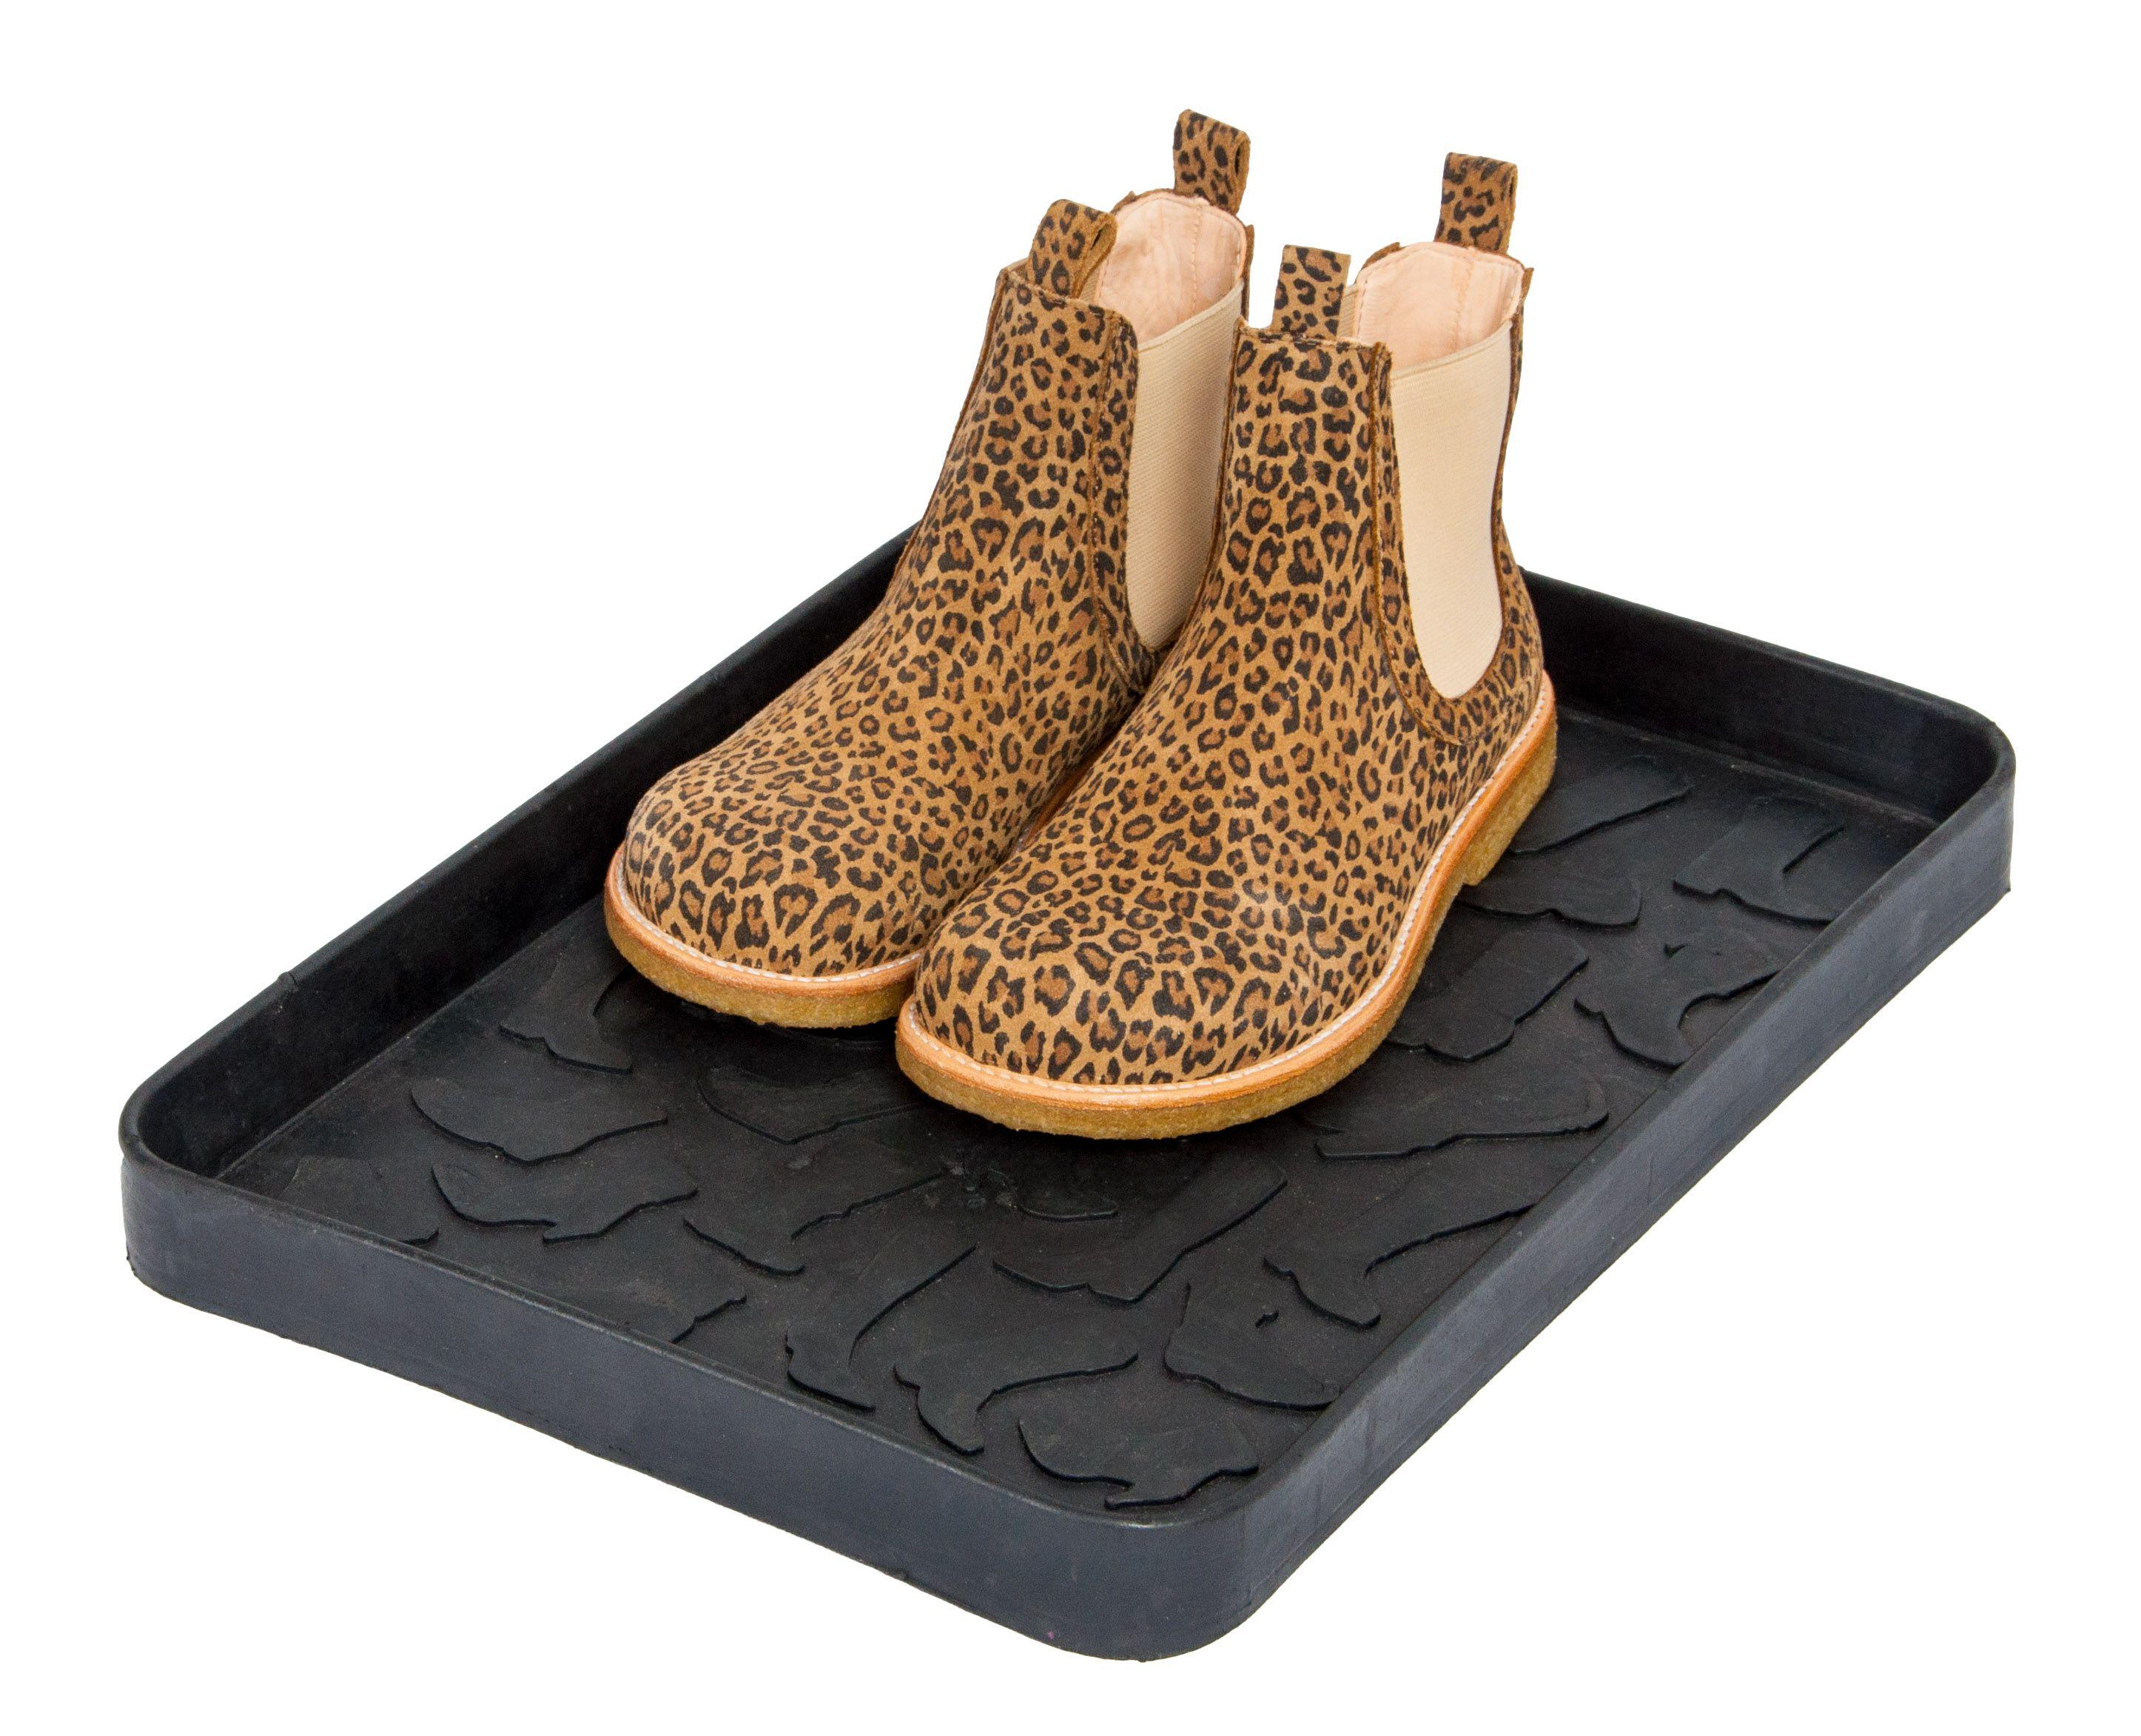 Shoe an boot tray tica copenhagen 28x38 cm Schuh pED7H